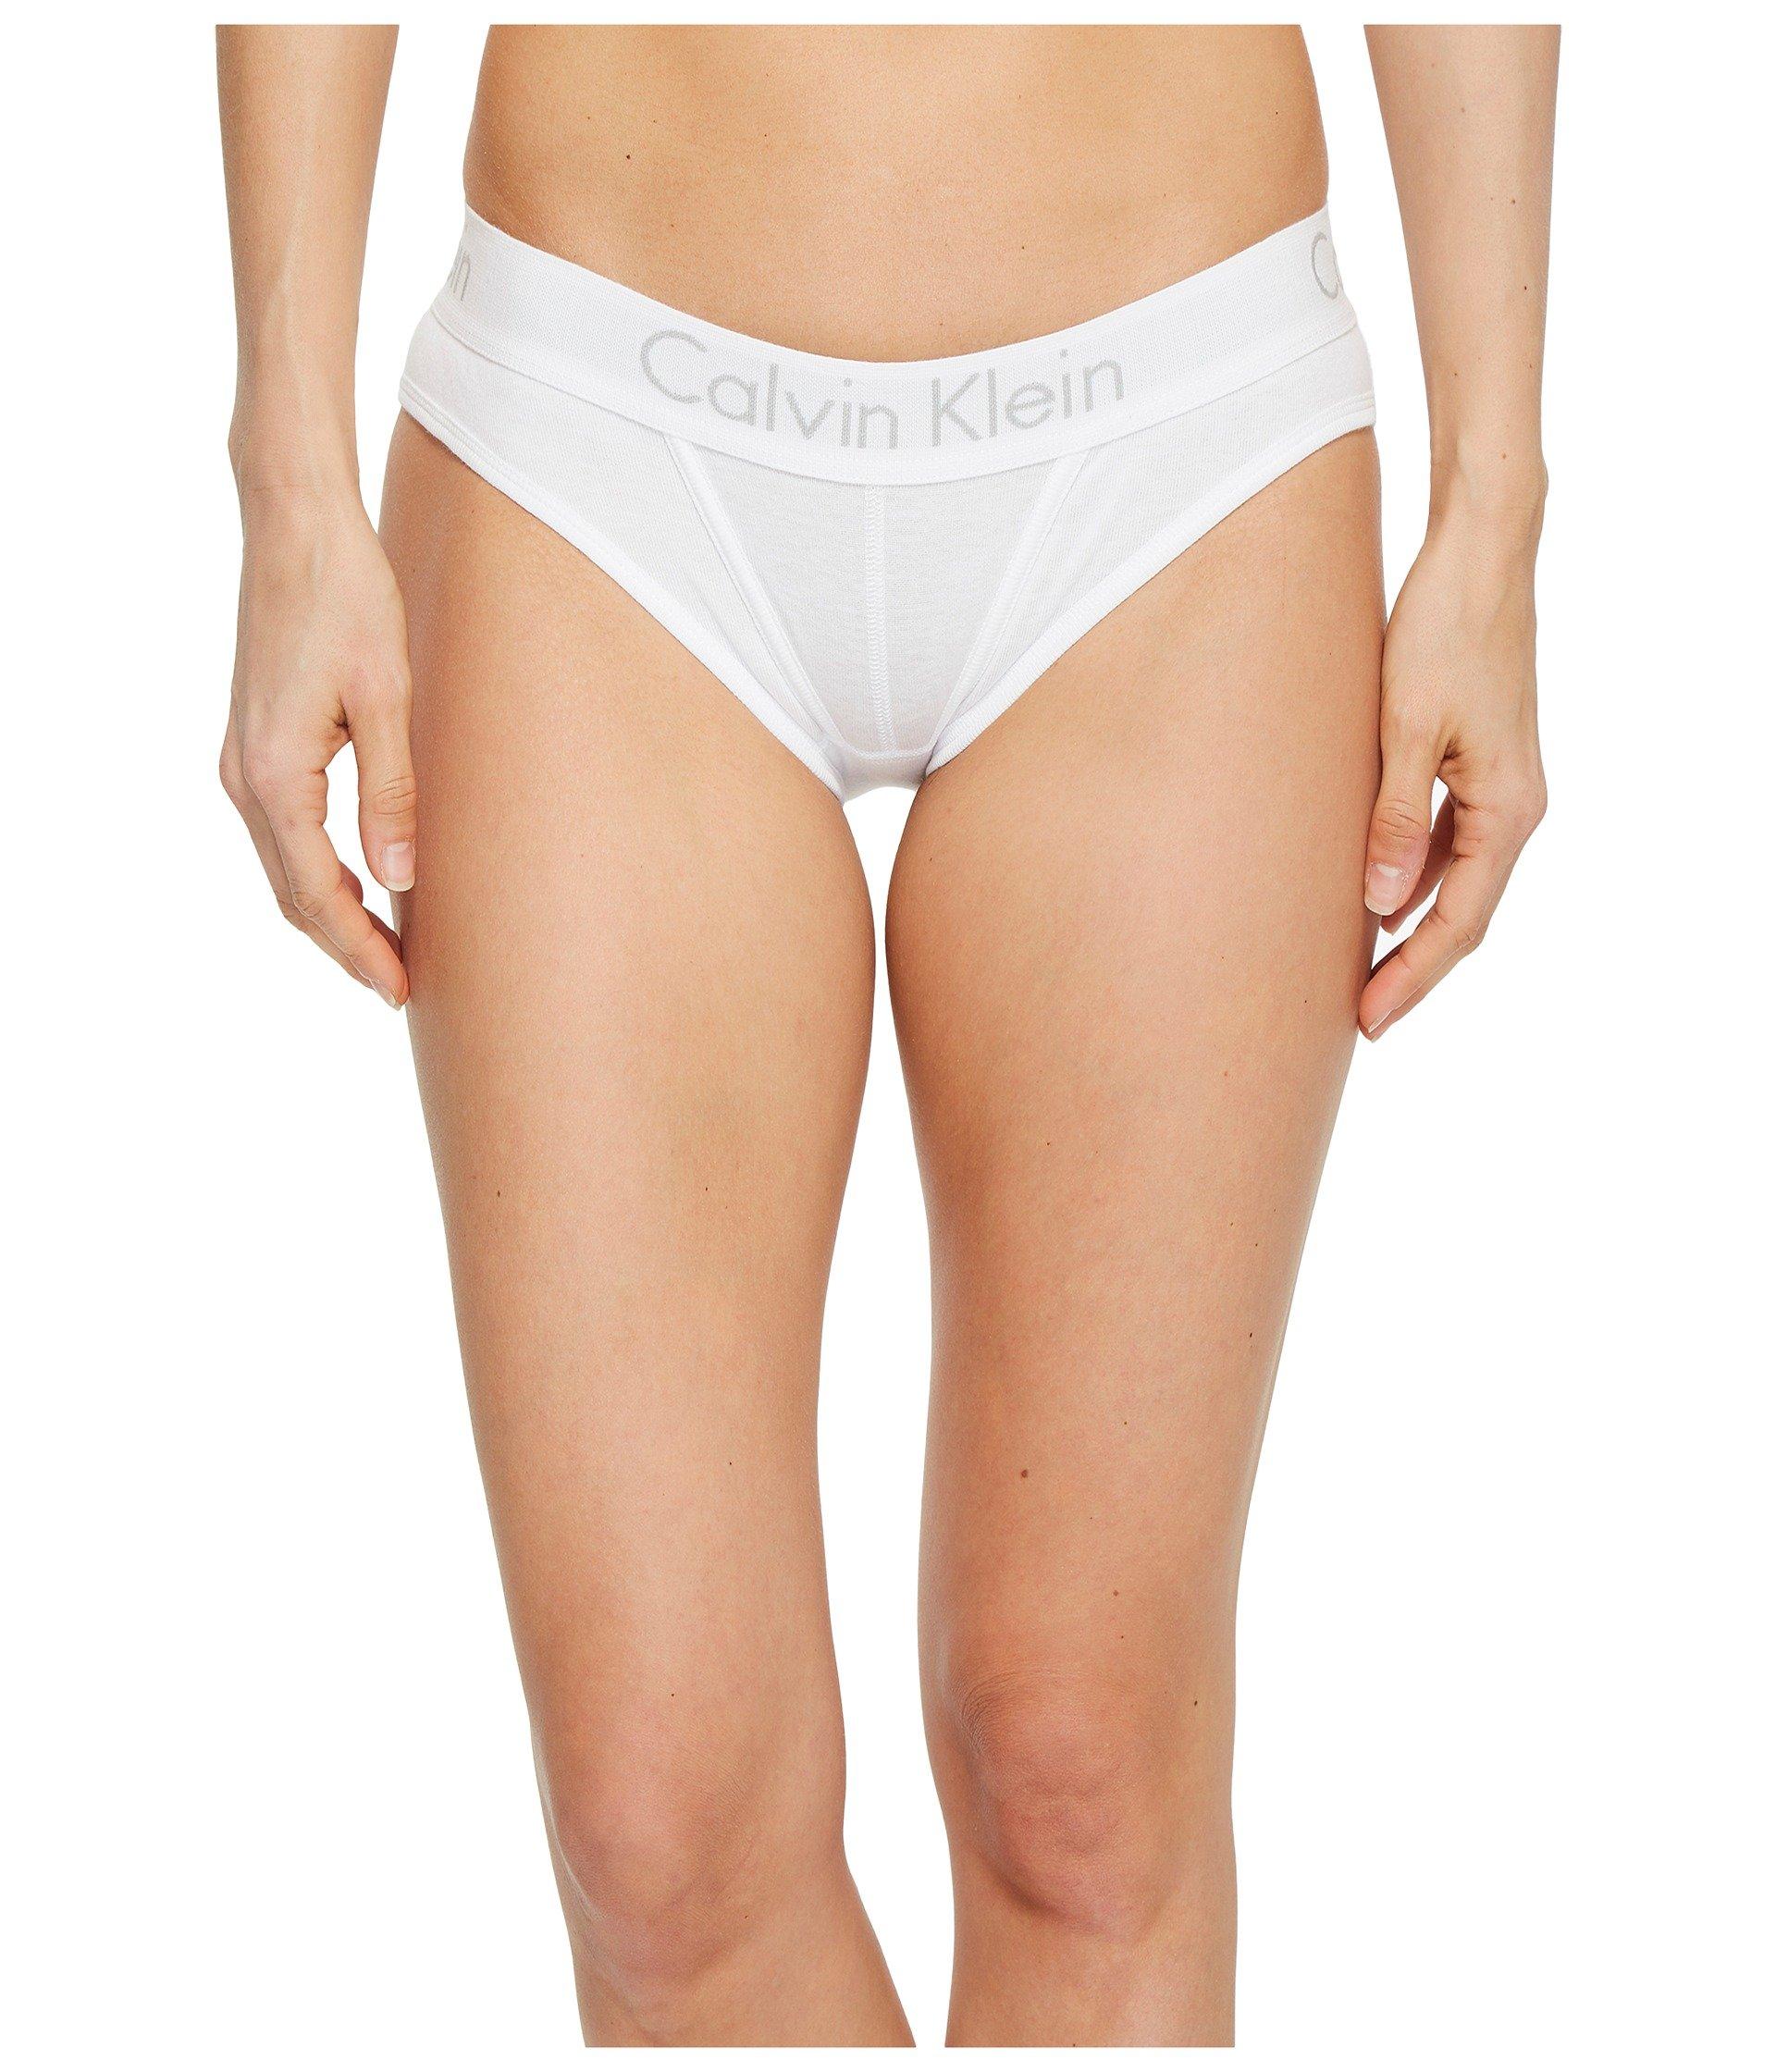 Klein Bikini Calvin White Body Underwear AxnnPcdW